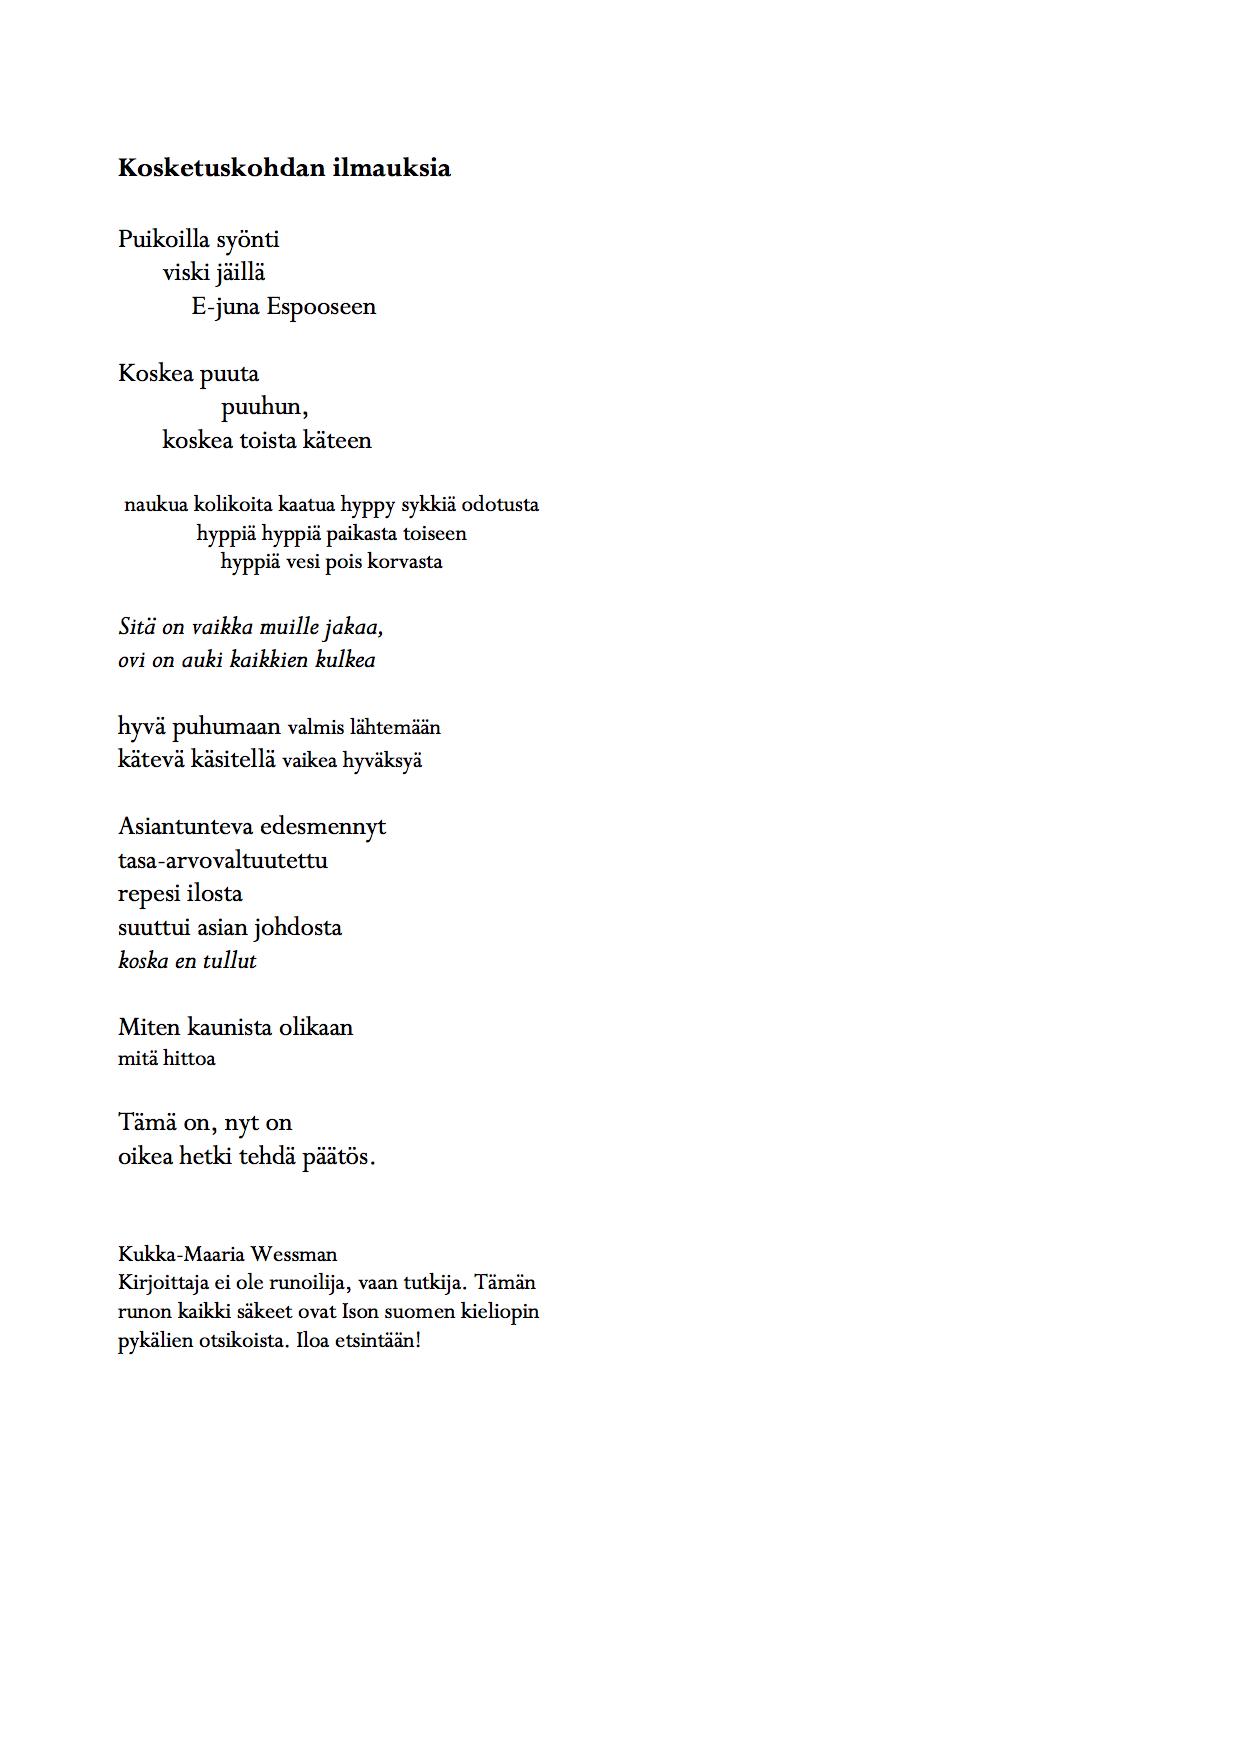 ISK-runous_Kieleke_kmwessman